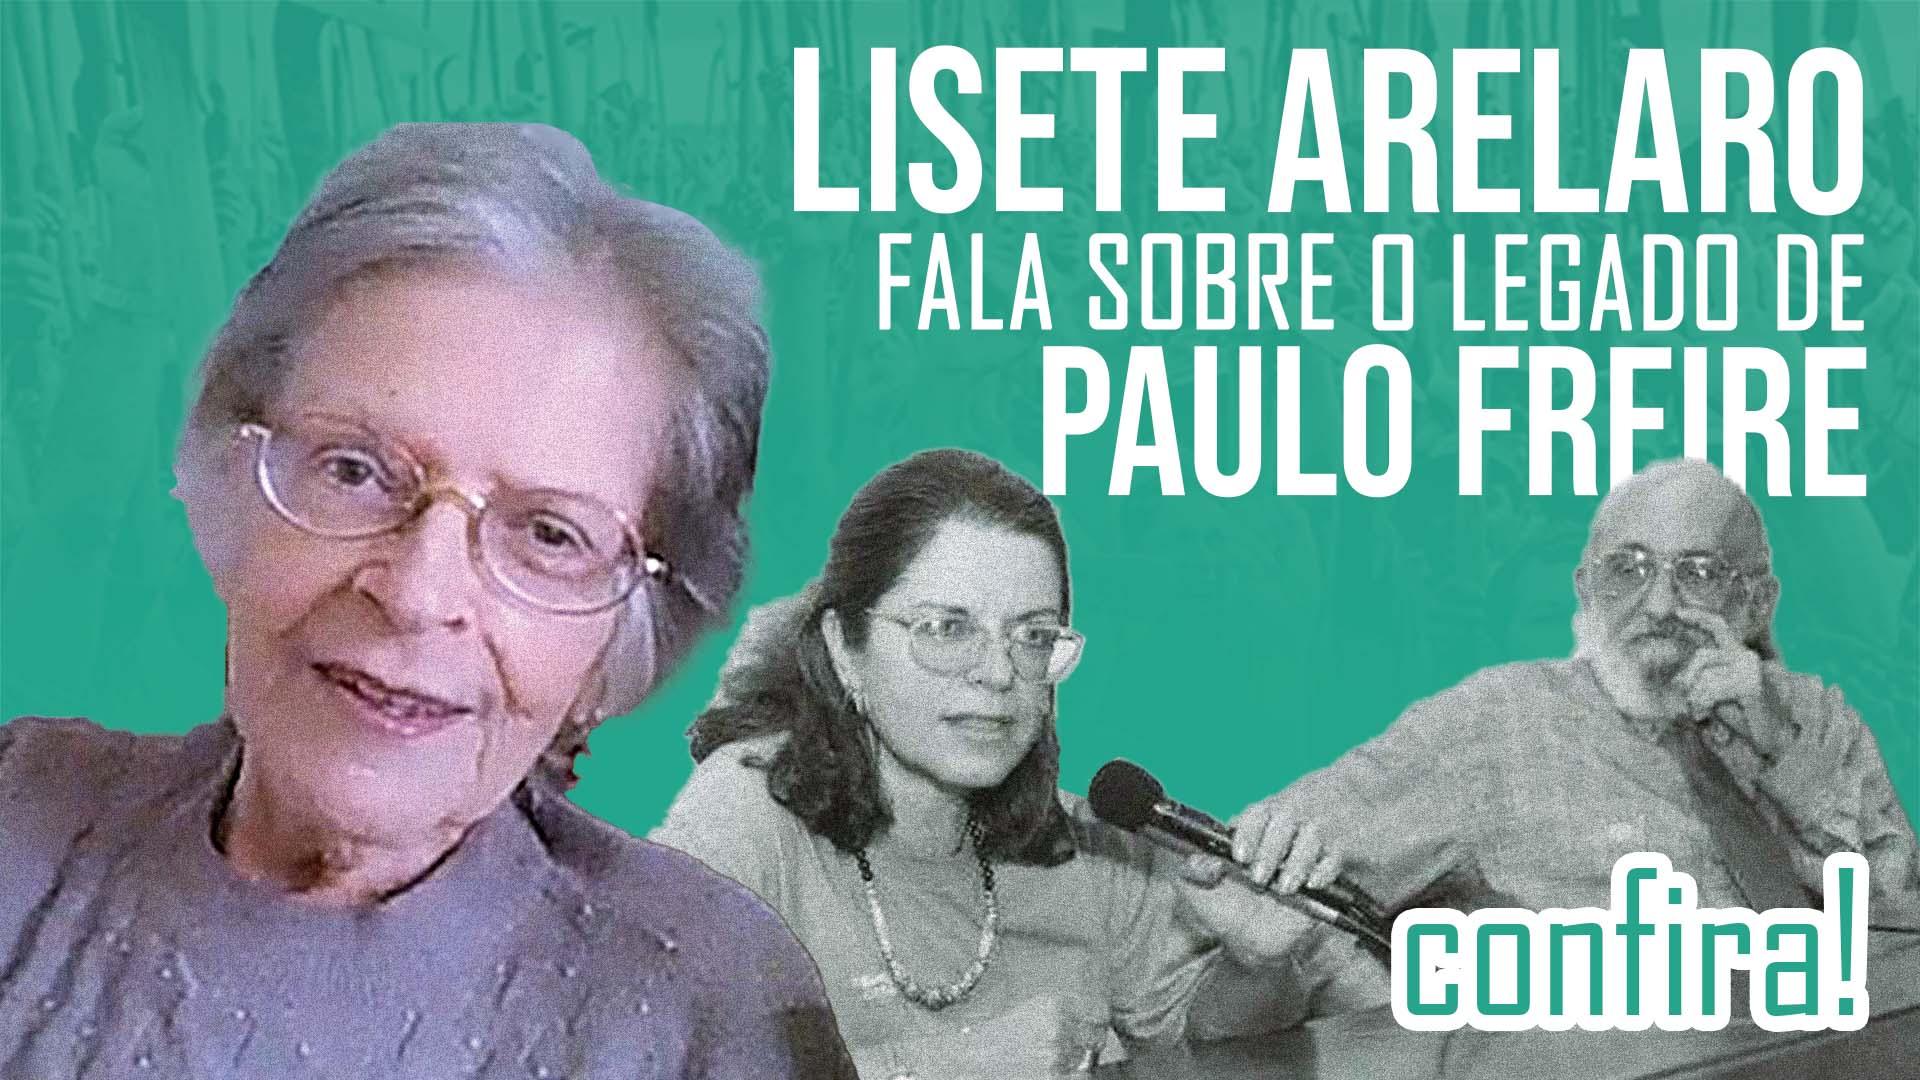 Lisete Arelaro fala sobre o legado de Paulo Freire